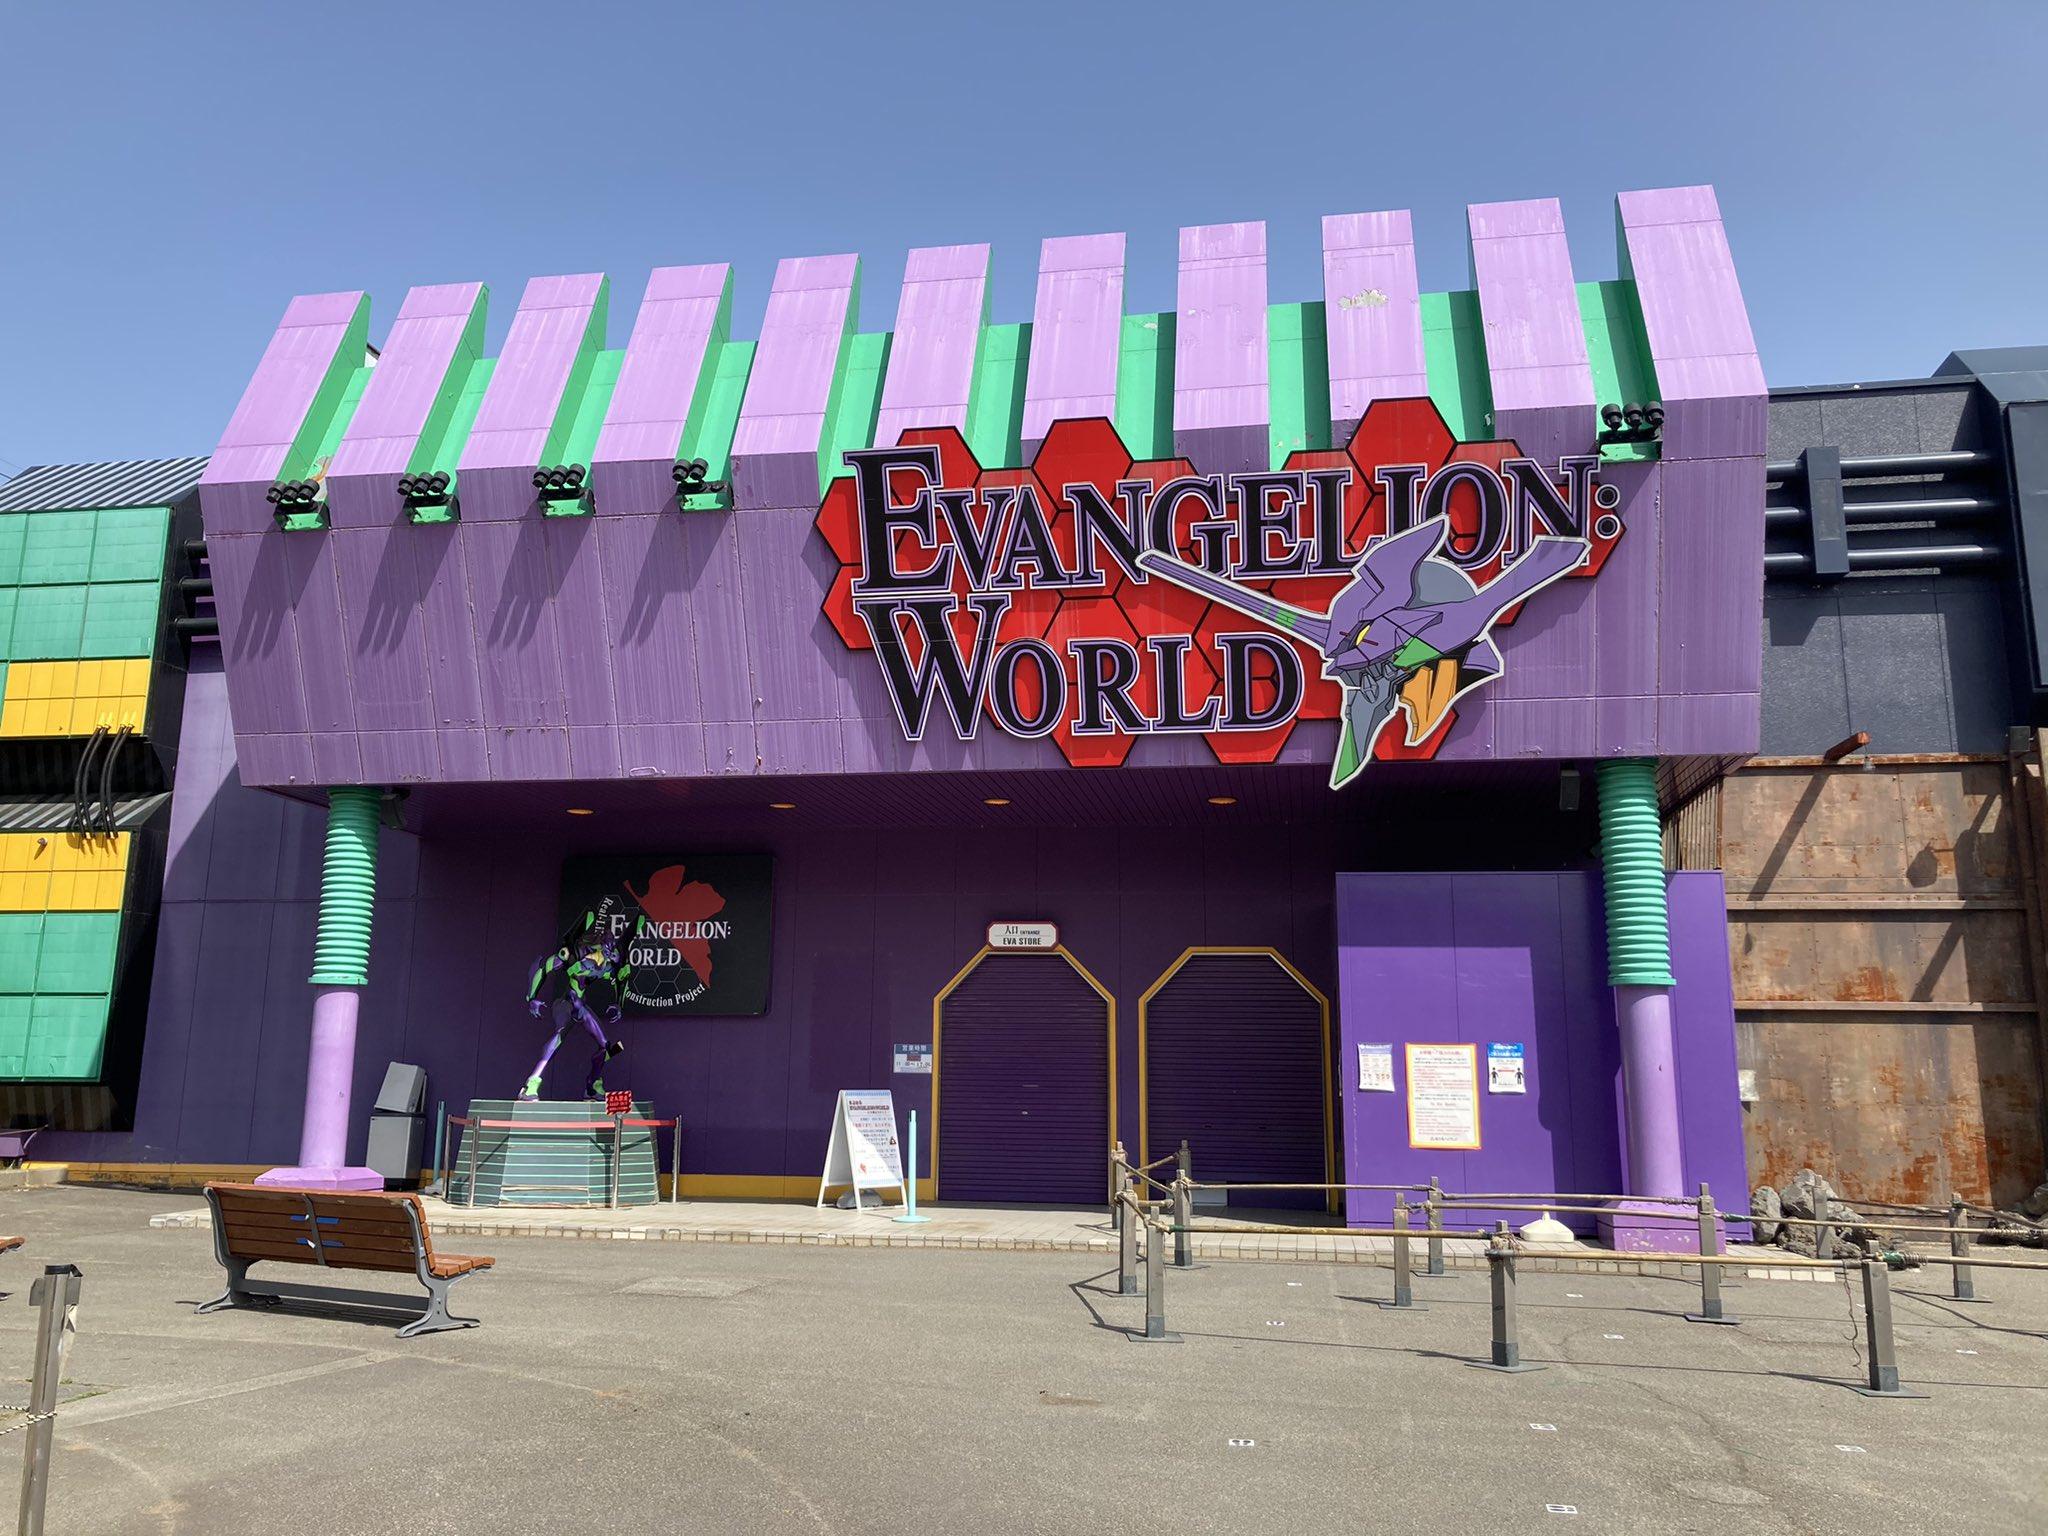 EVANGELION: MUNDO